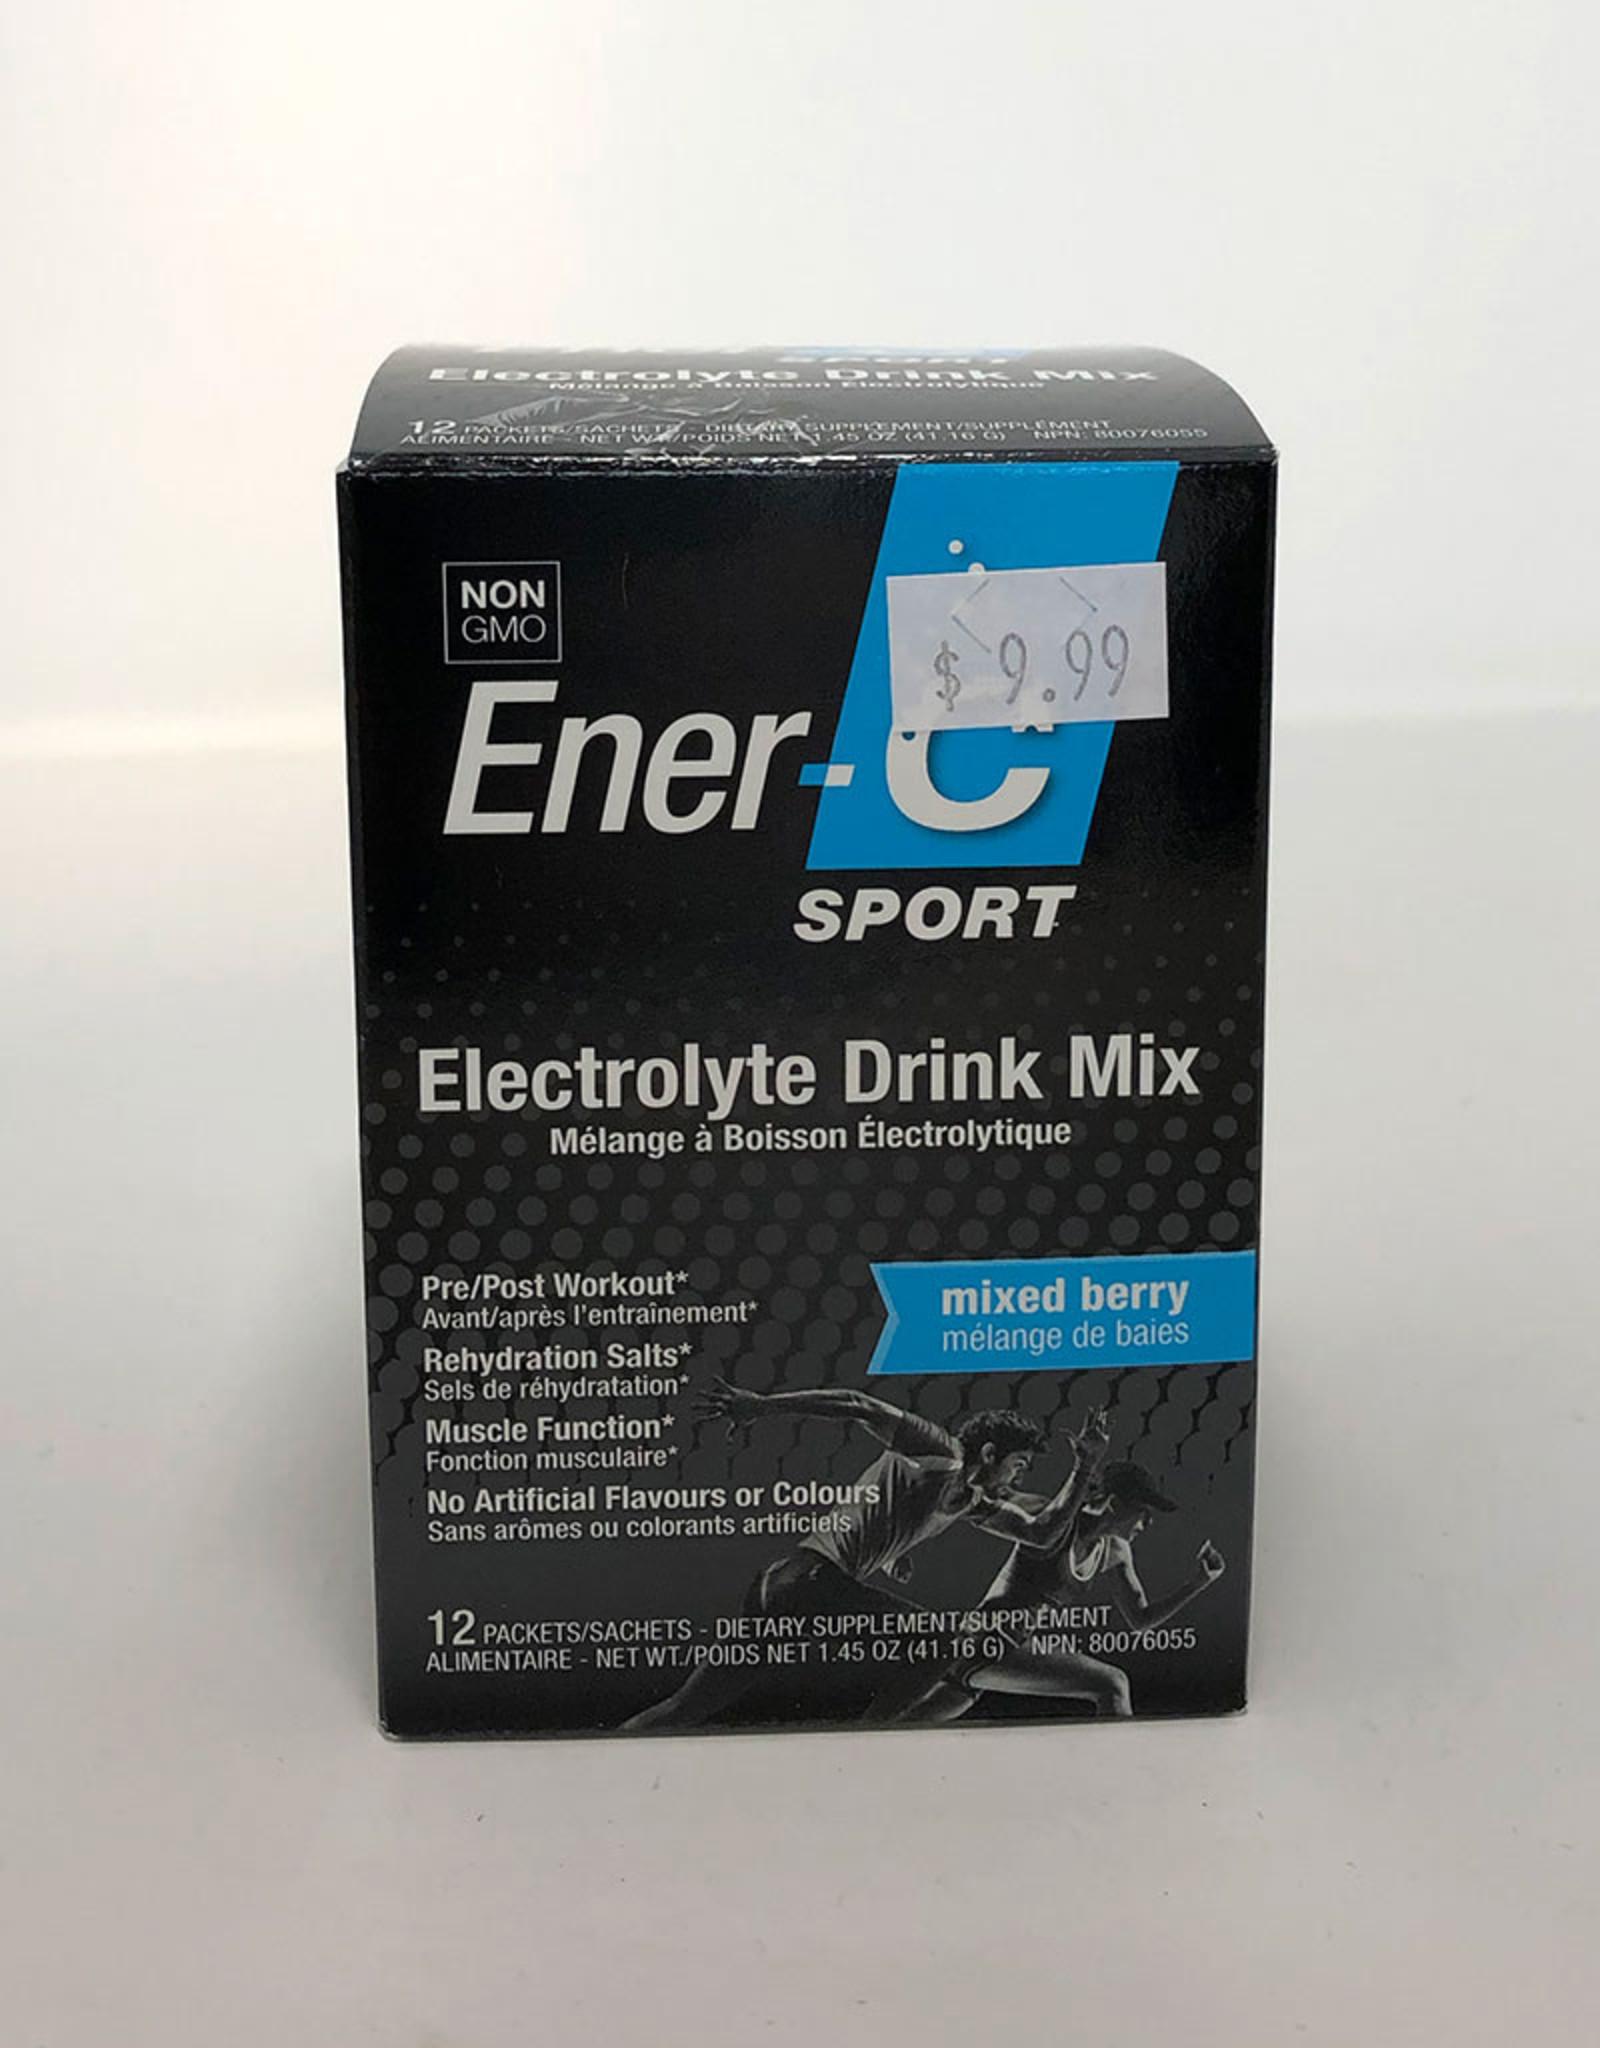 Ener-C Ener-C - Sport Electrolyte Drink Mix, Mixed Berry (12pk)